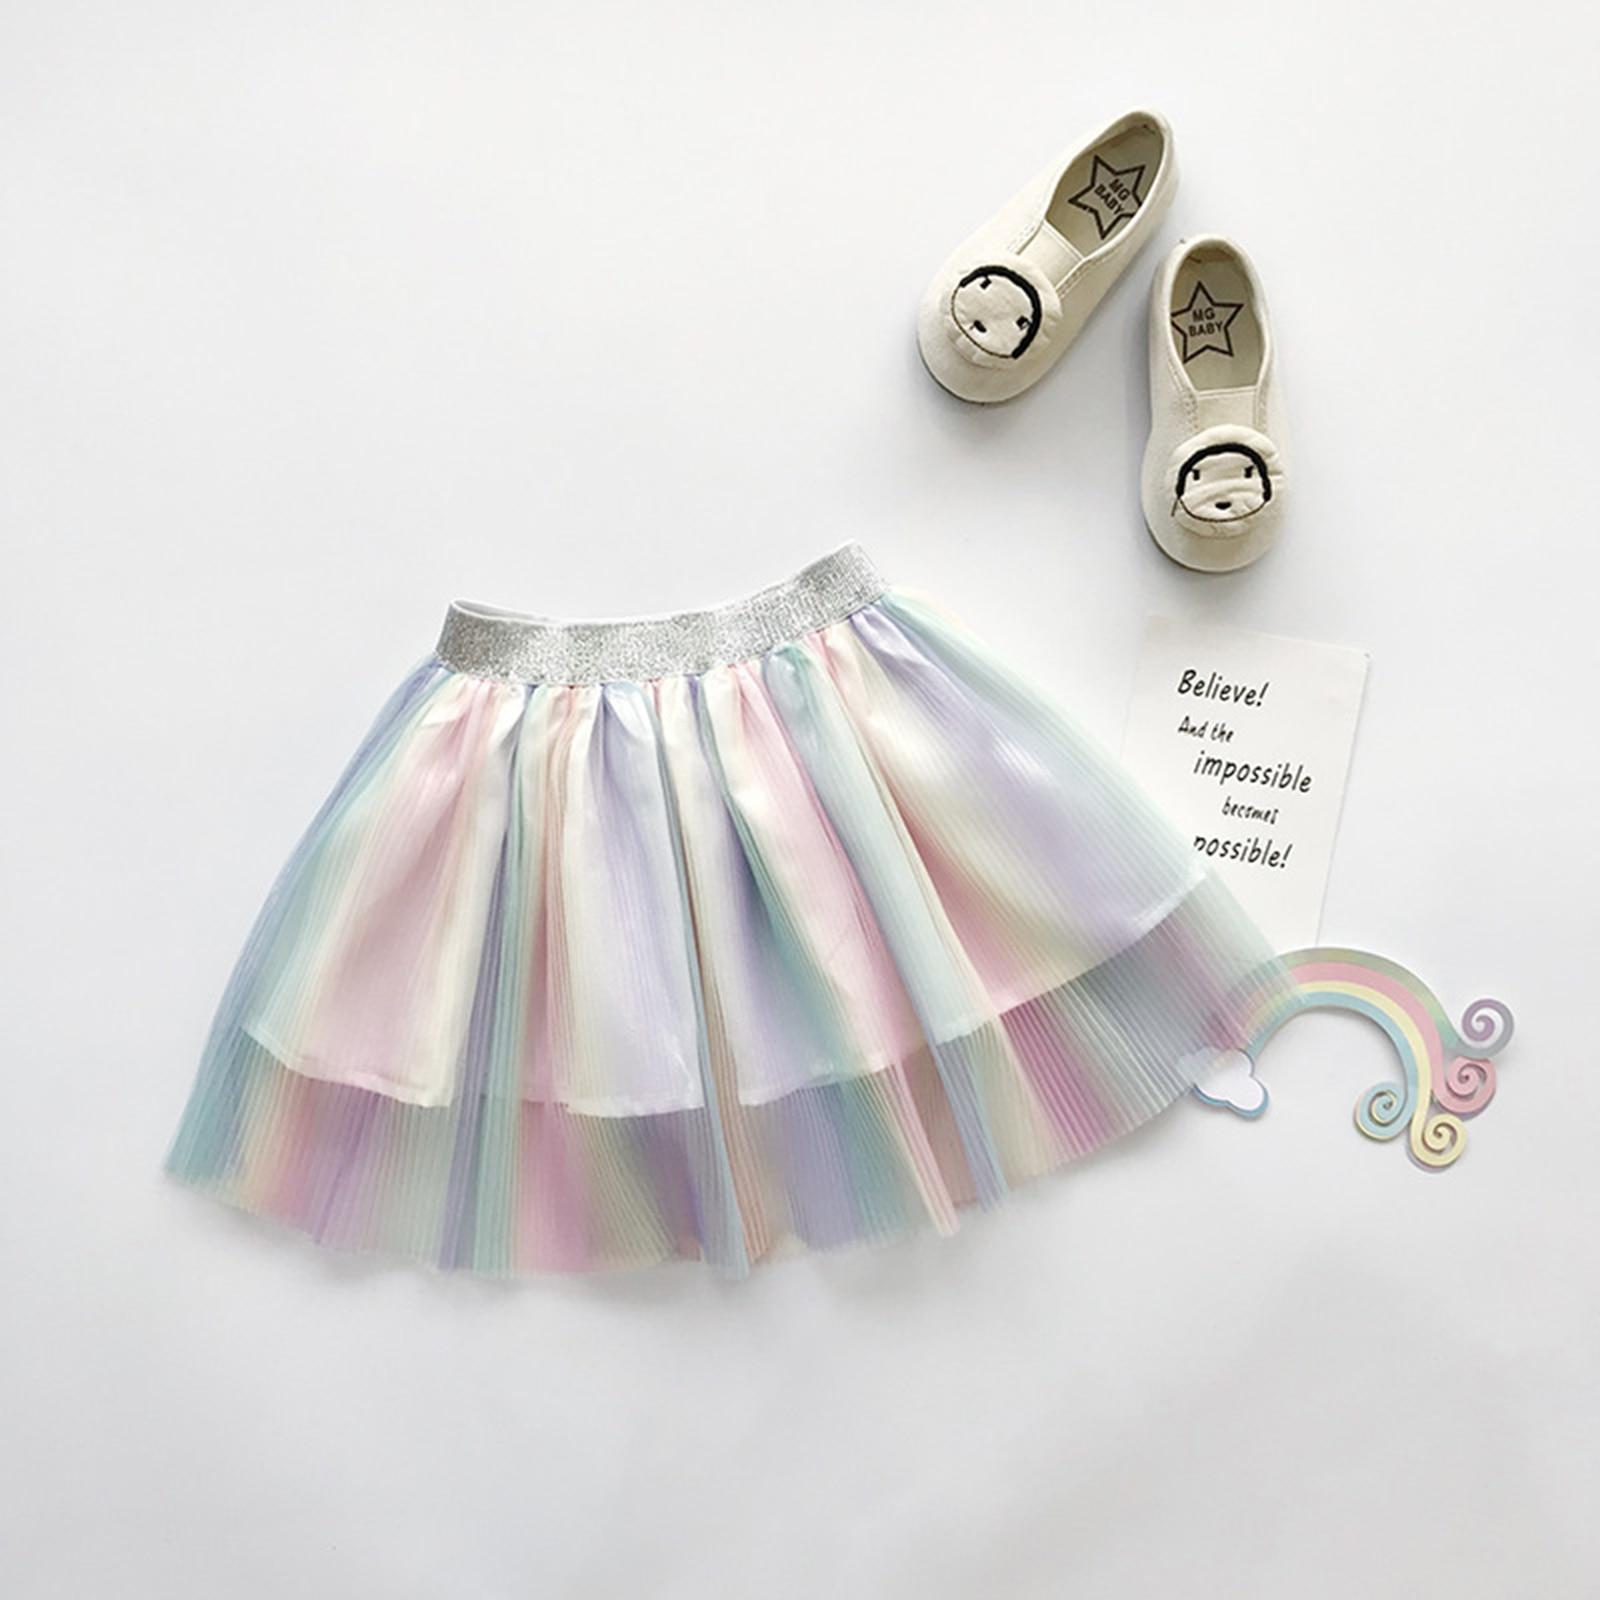 Pudcoco Girl's Rainbow Color Short Skirt Multicolor Elastic Glitter Belt Waist Pleated Skirt Fresh Colorful Baby Summer Clothes